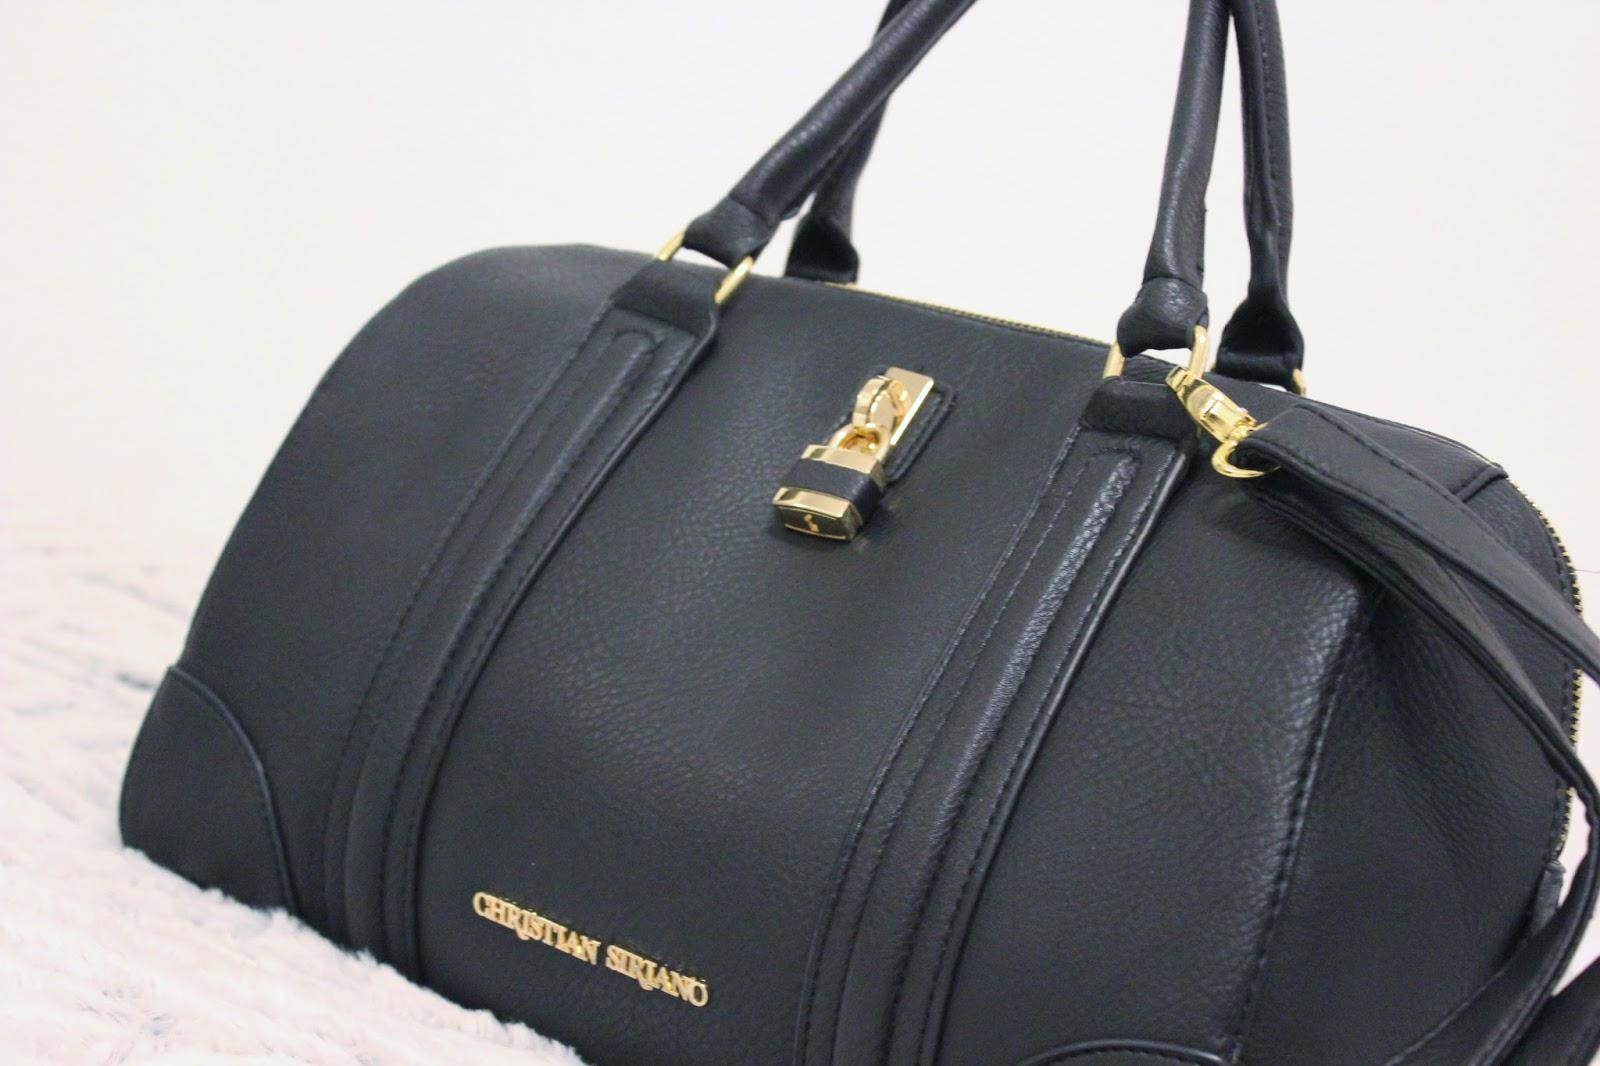 Christian Siriano Bag - Stacia 328f5ff7b5b0